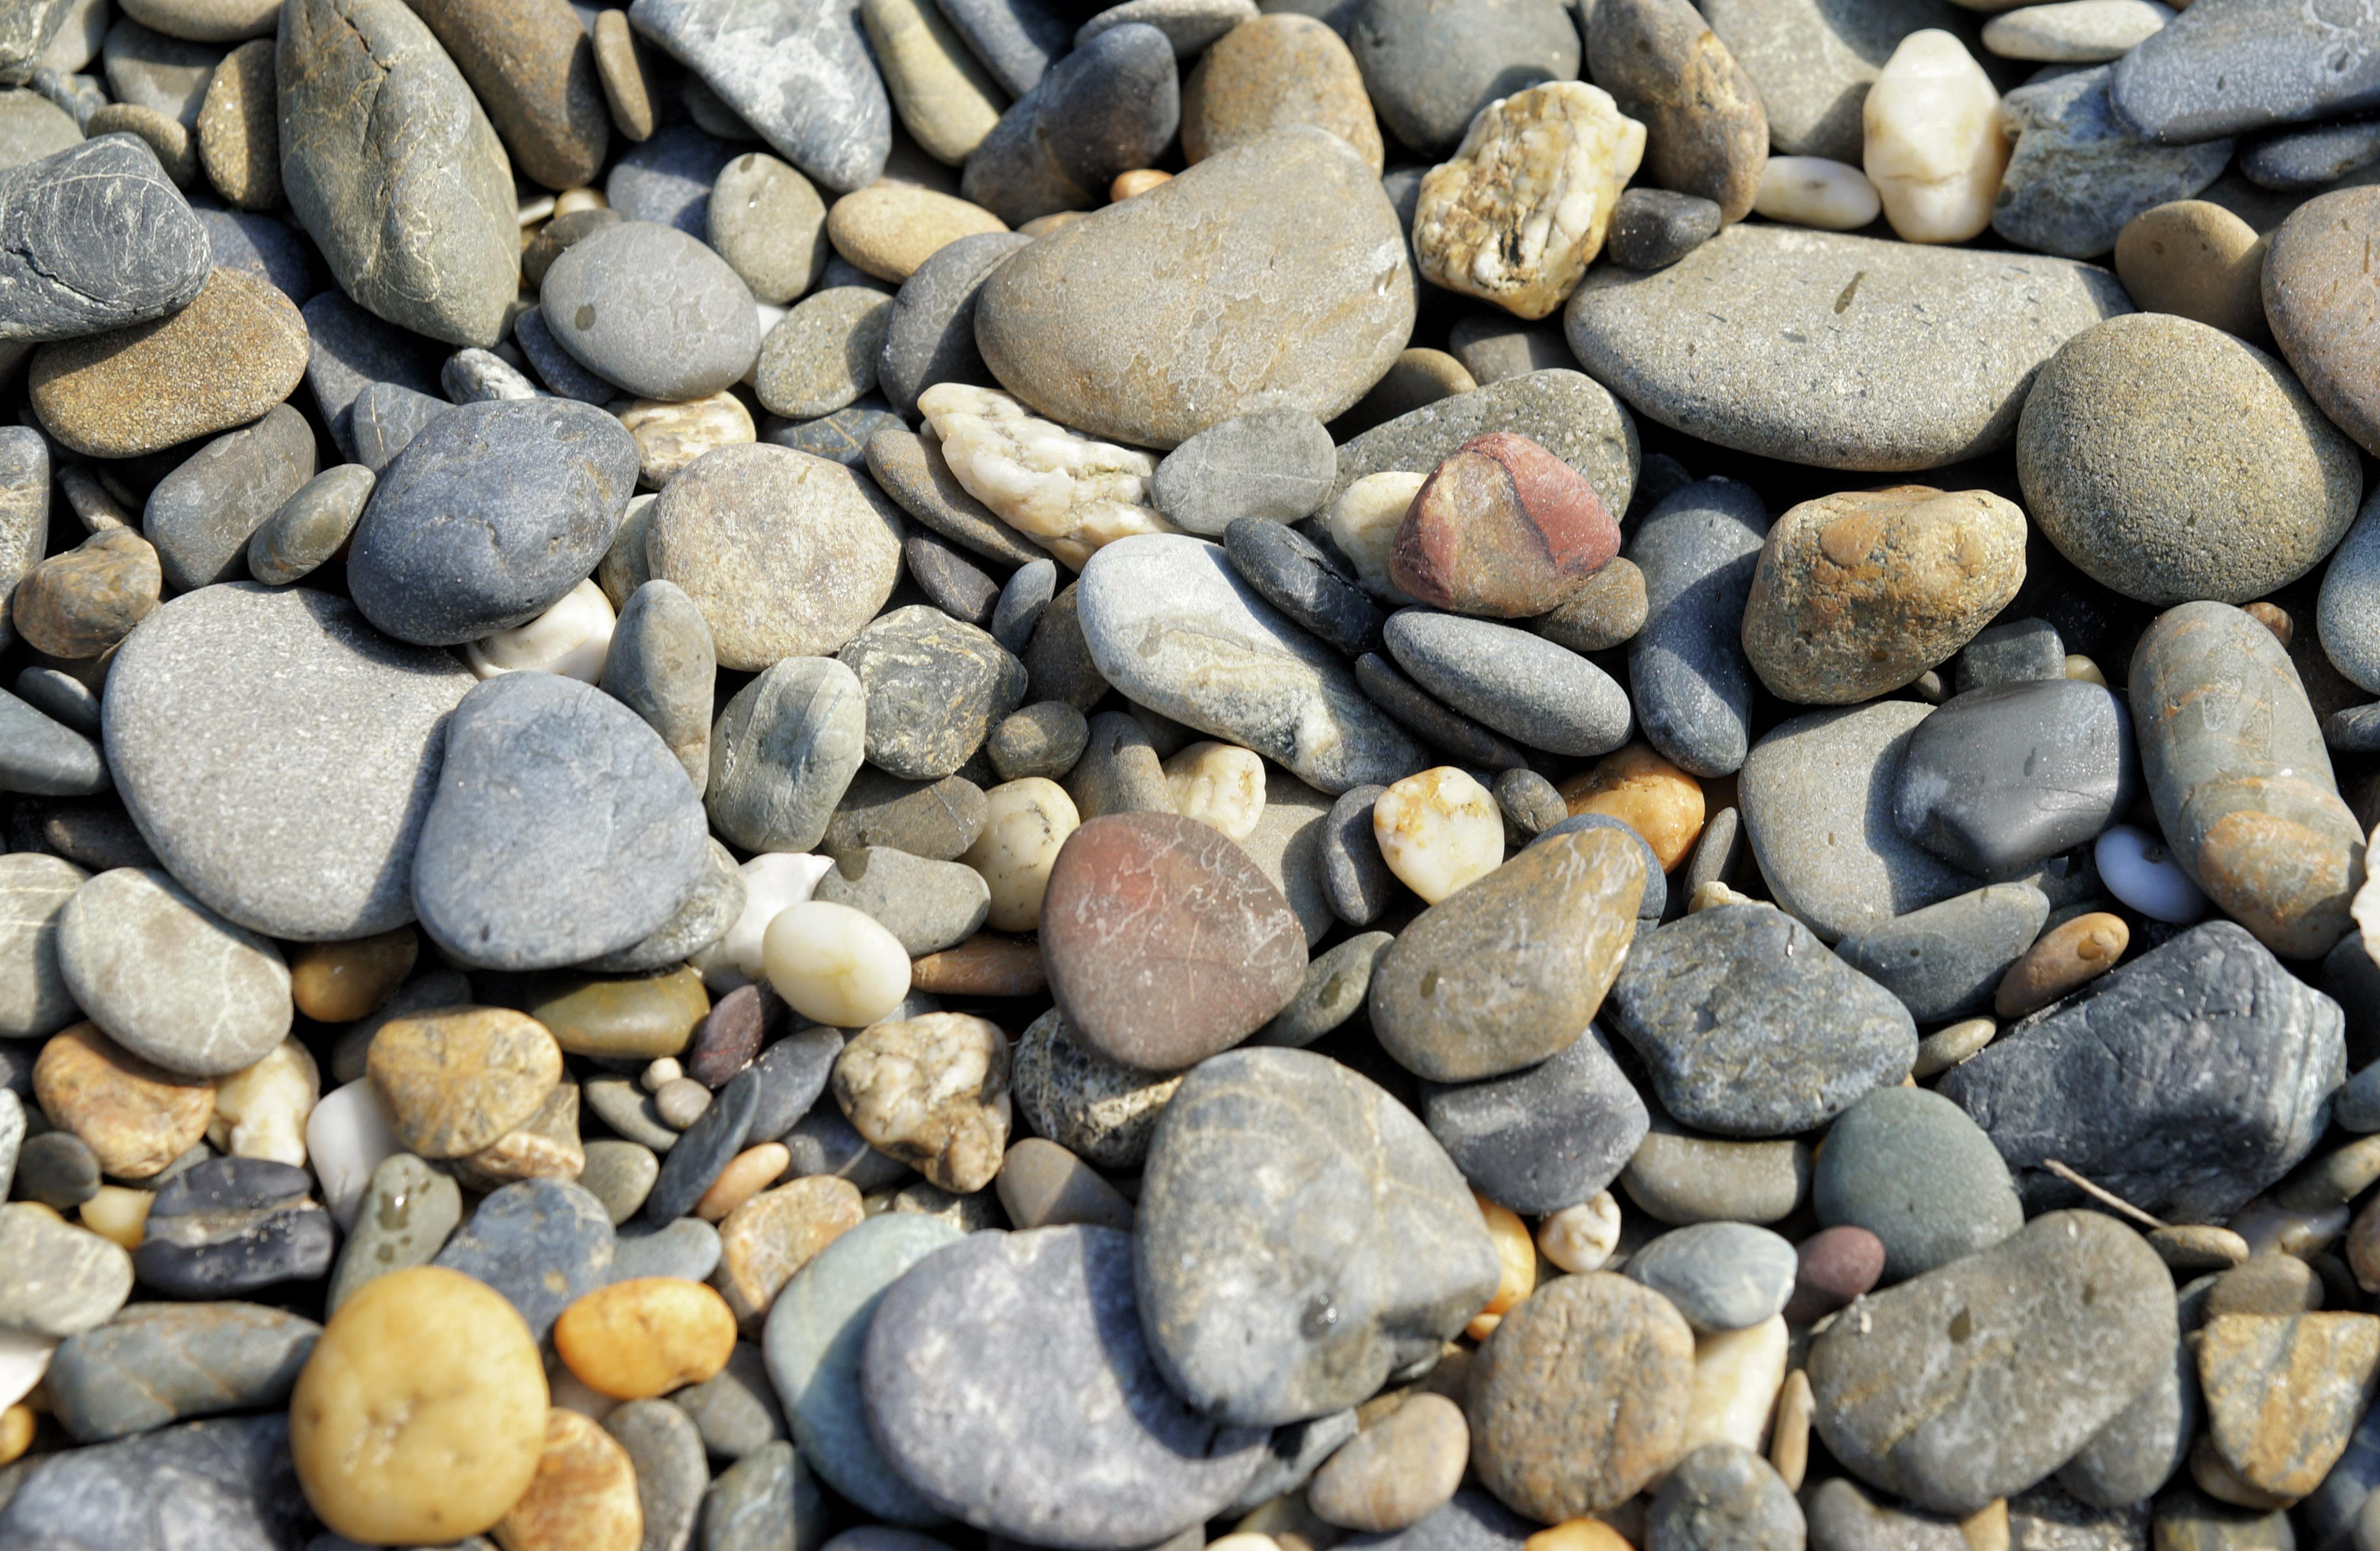 Beach Stones Background Texture Image